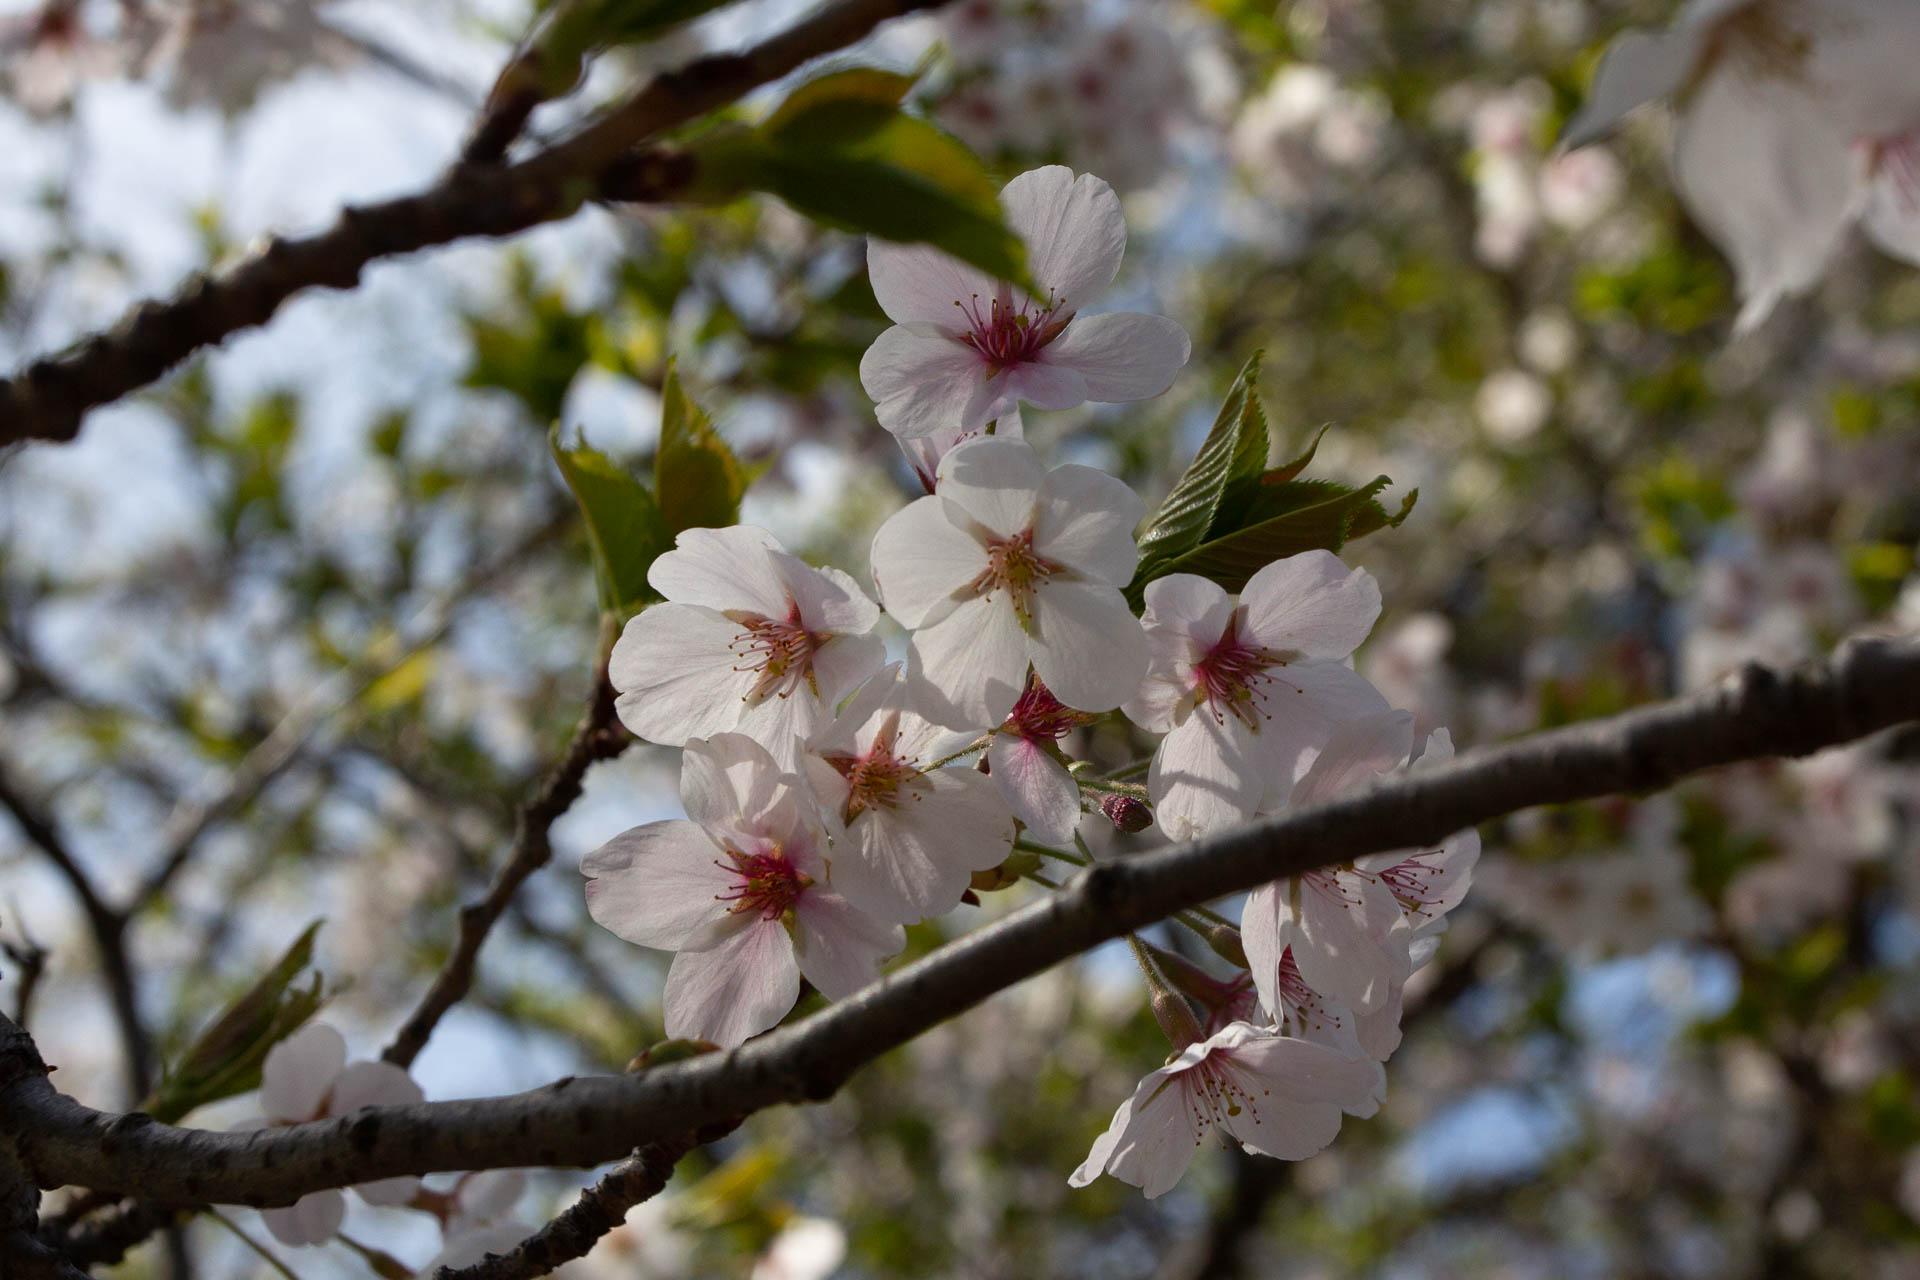 Sakura-Watch-May-9-2018-2.jpg